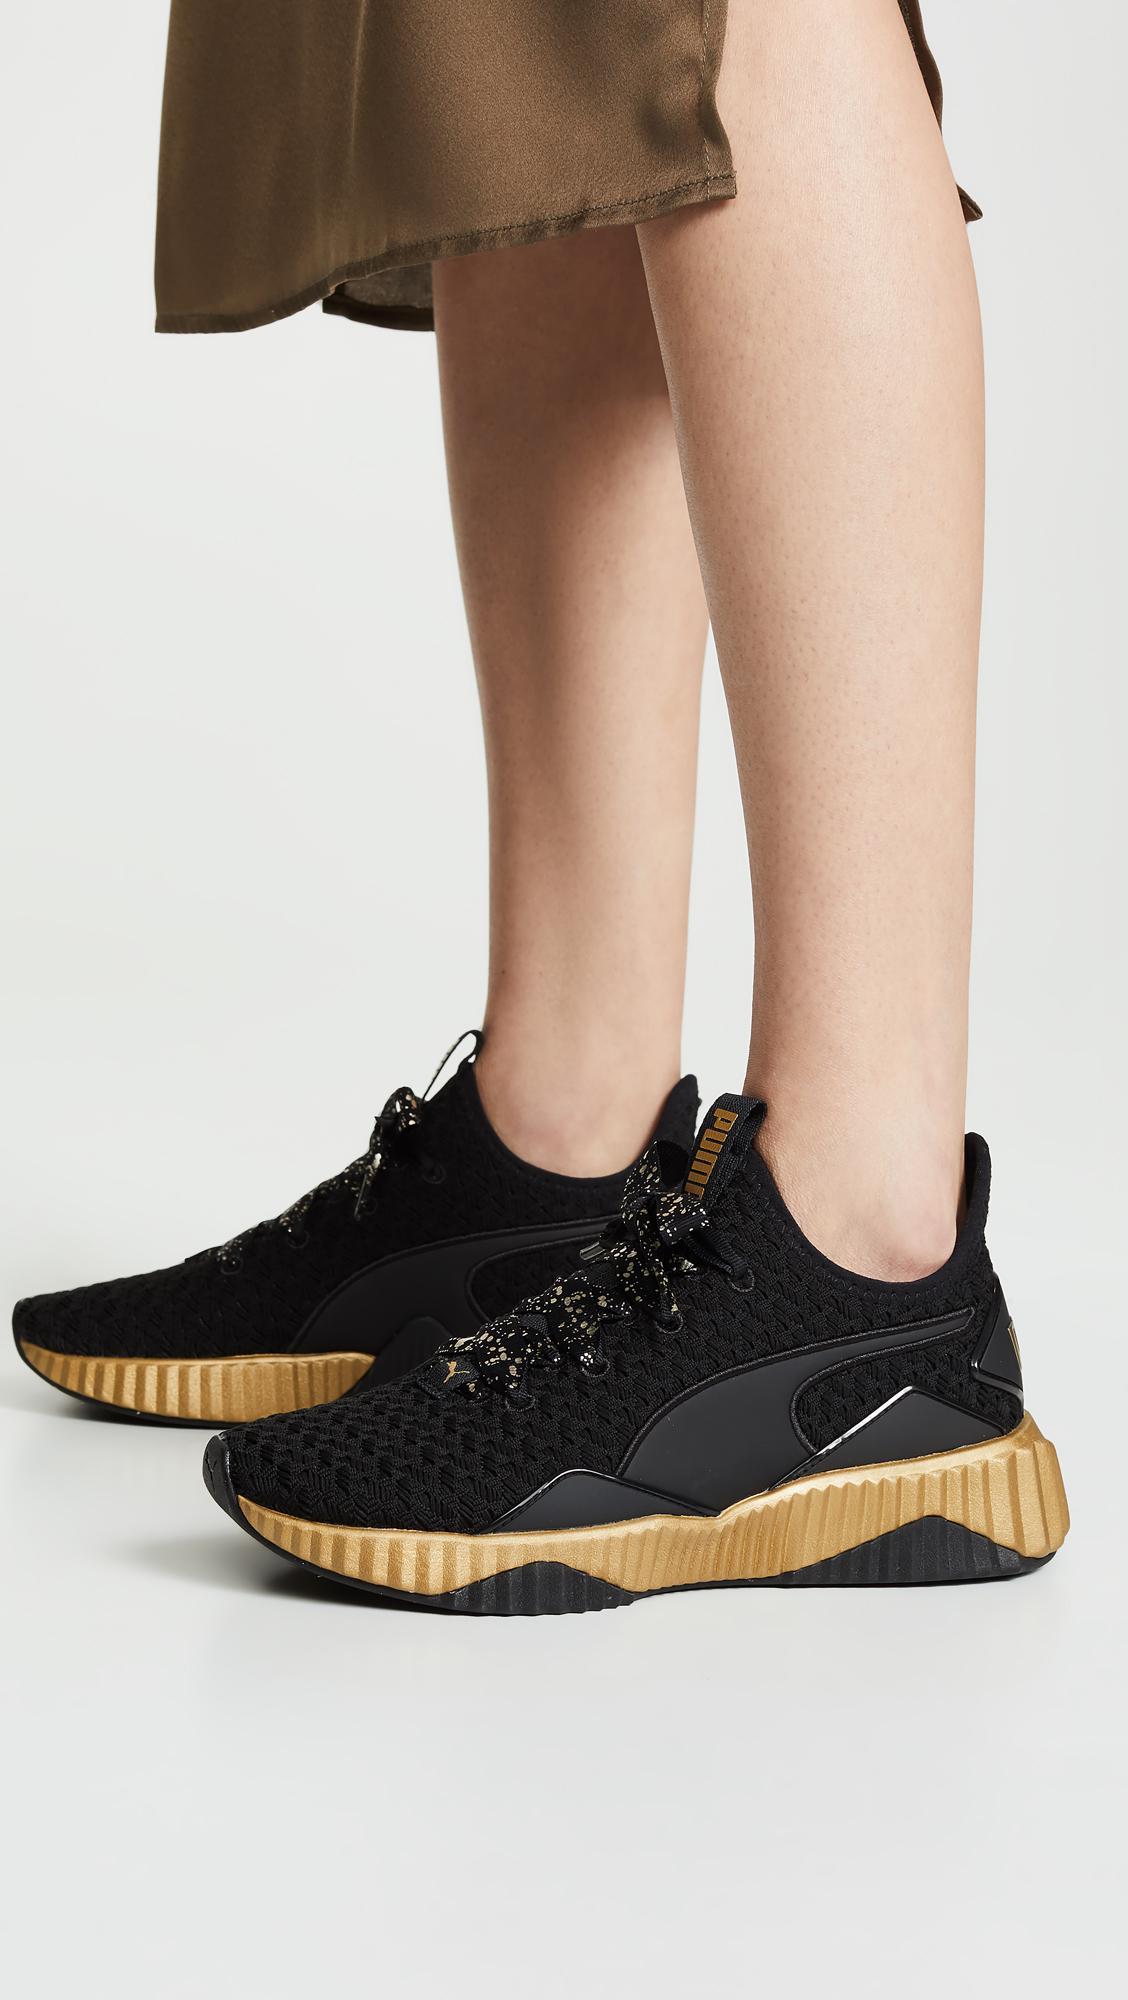 PUMA Defy Sparkle Sneakers in Black - Lyst